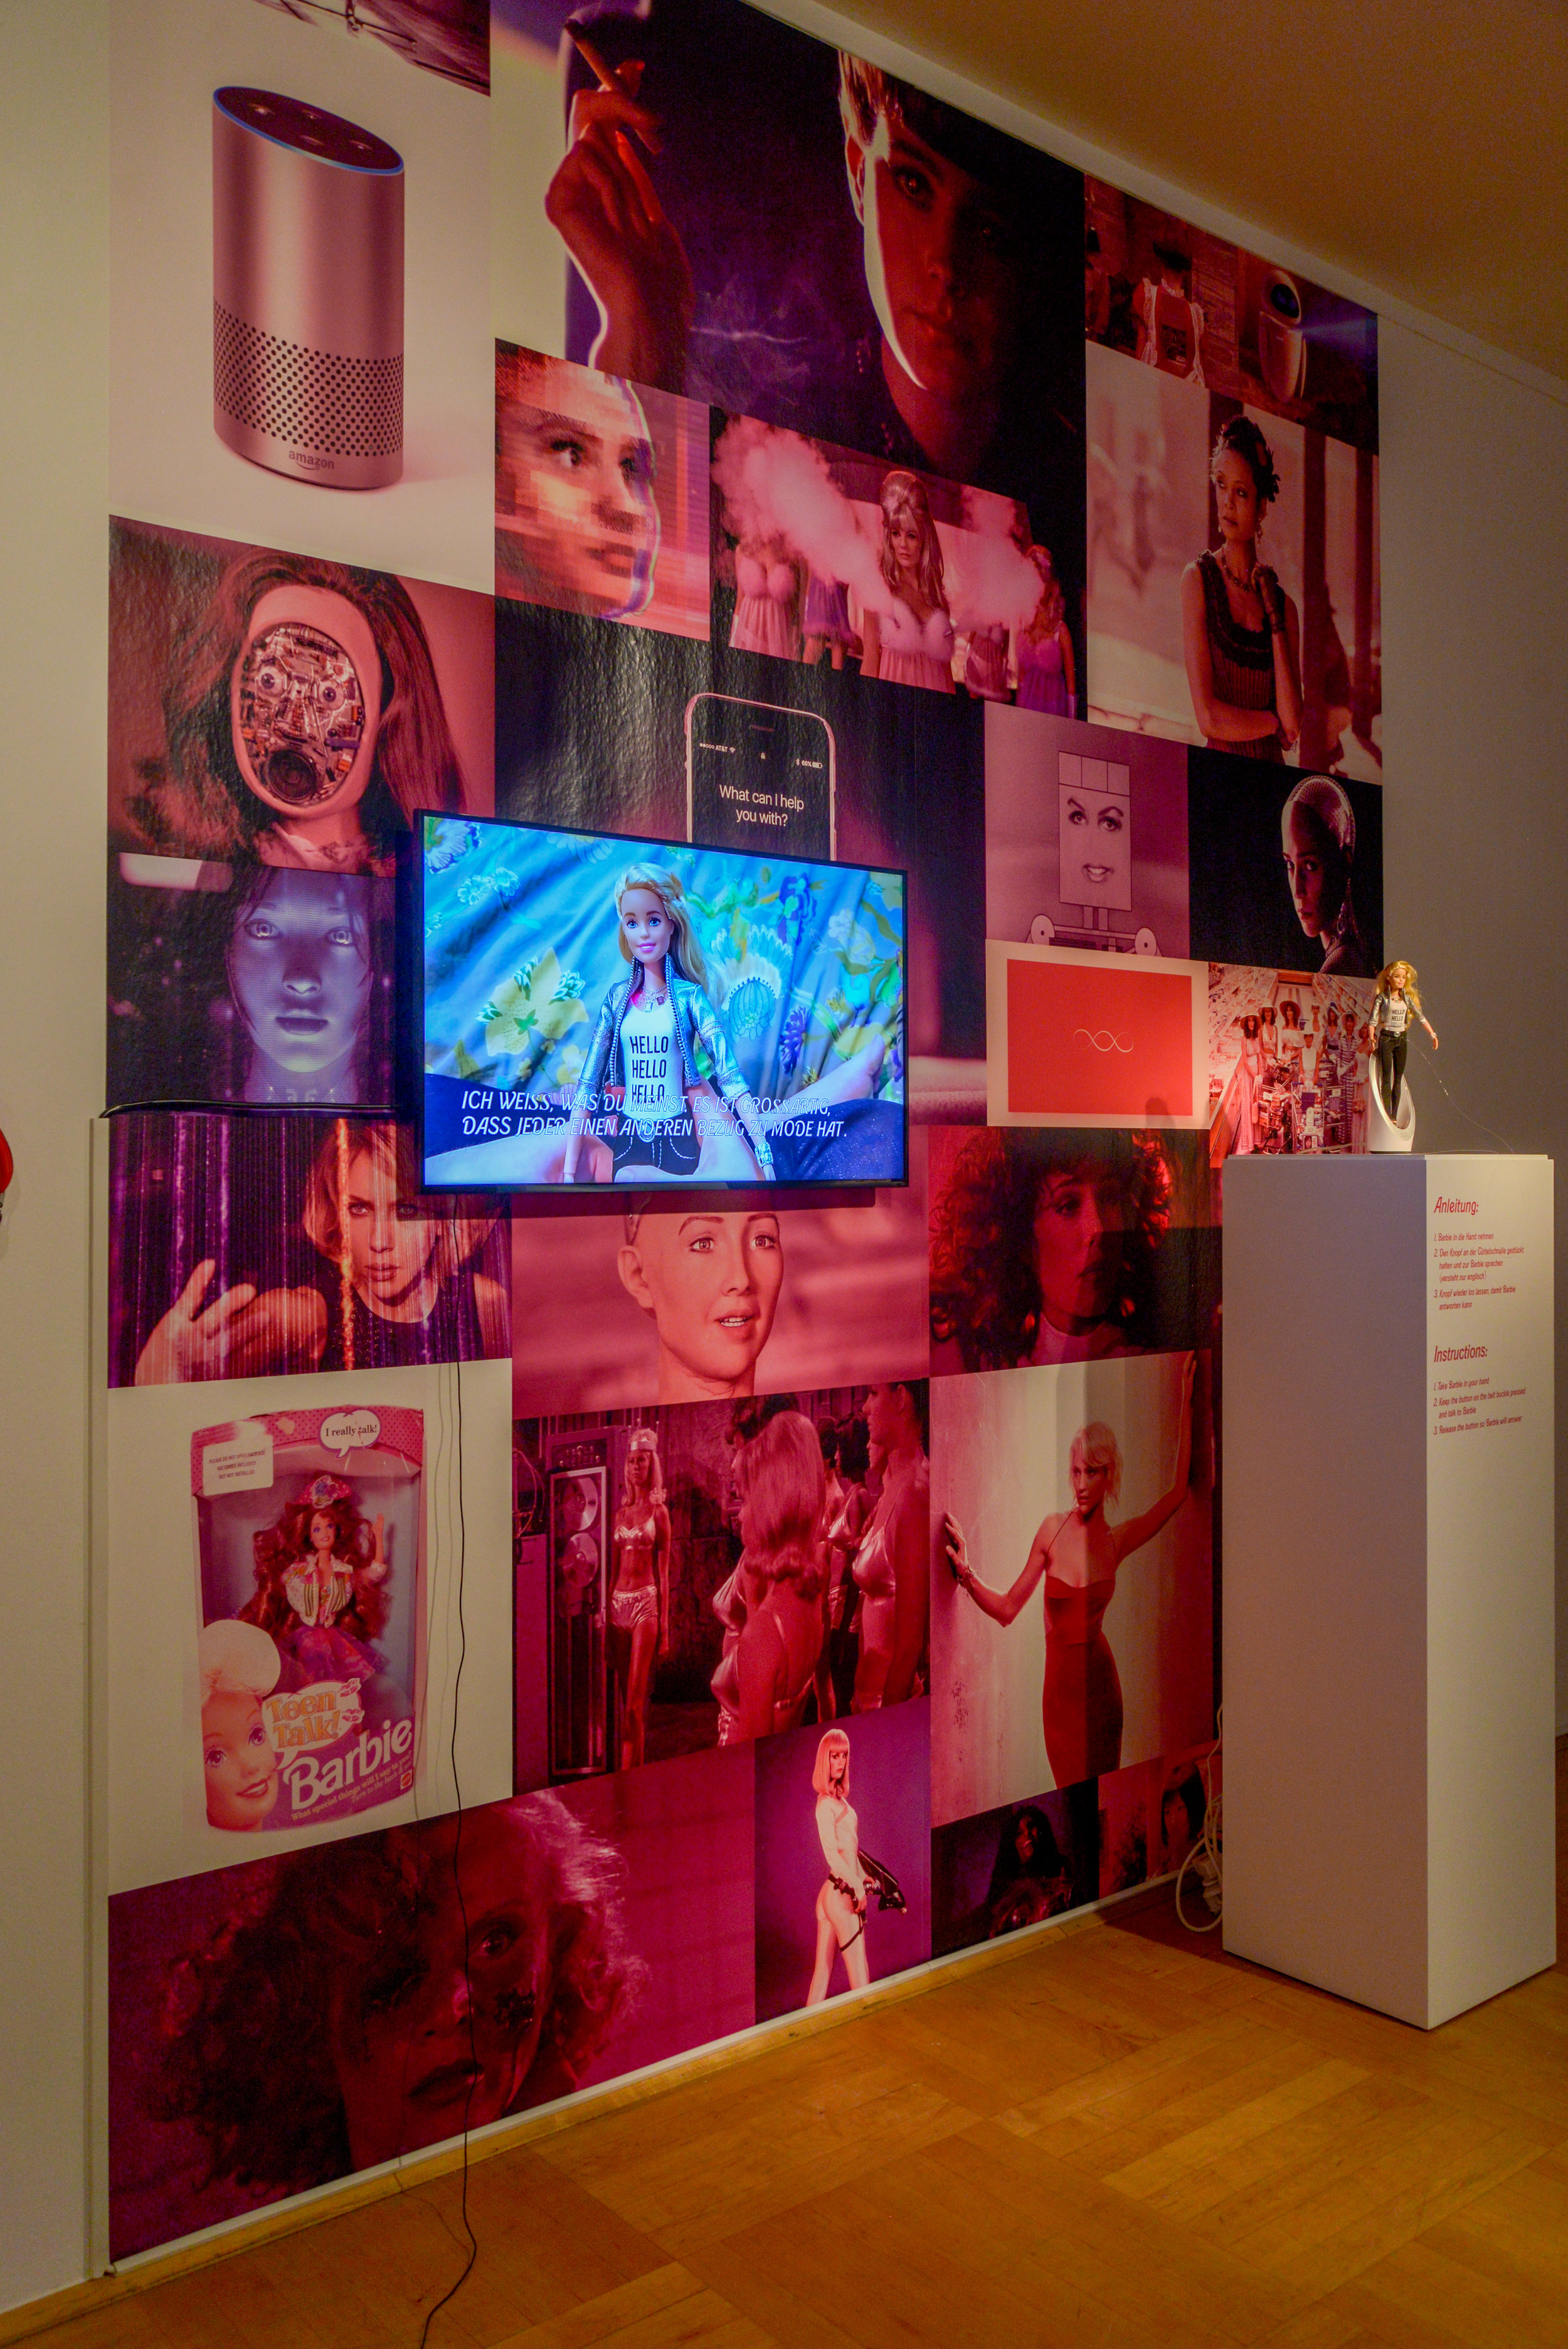 Exhibition view: PENDORAN VINCI, installation by Faith Holland, photo © Jonas Blume, 2018